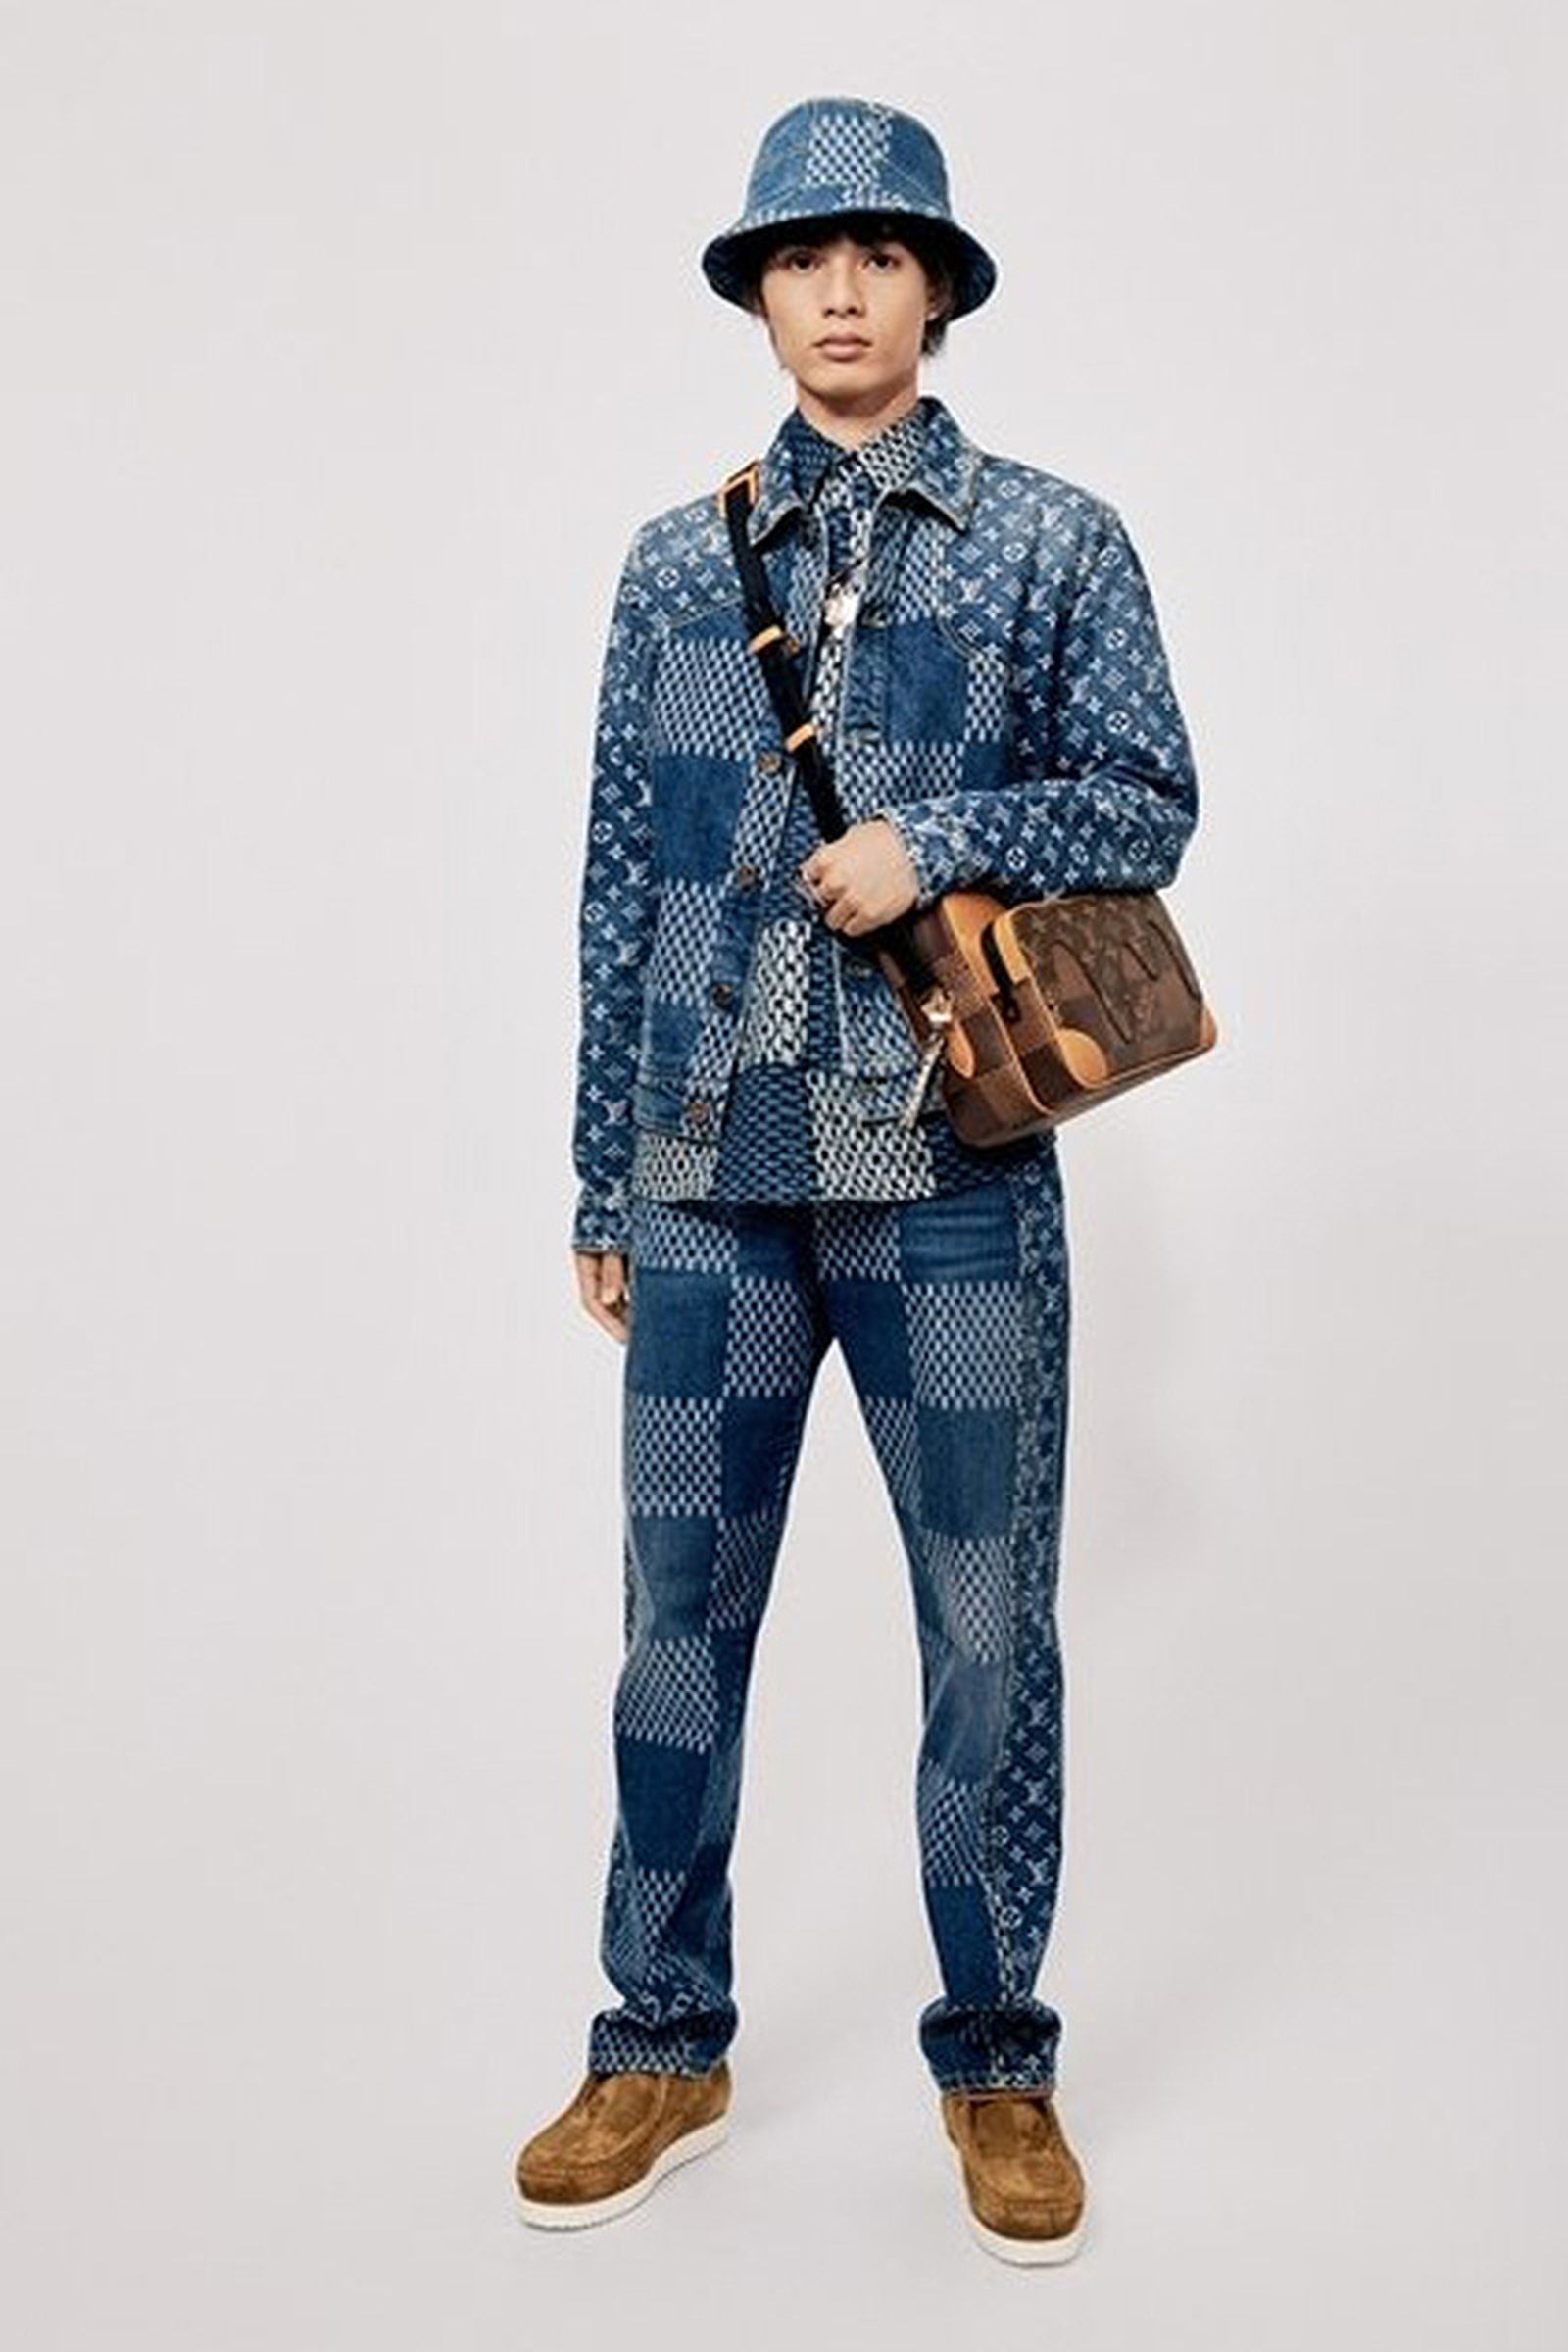 virgil-abloh-louis-vuitton-collab-nigo-streetwear-01